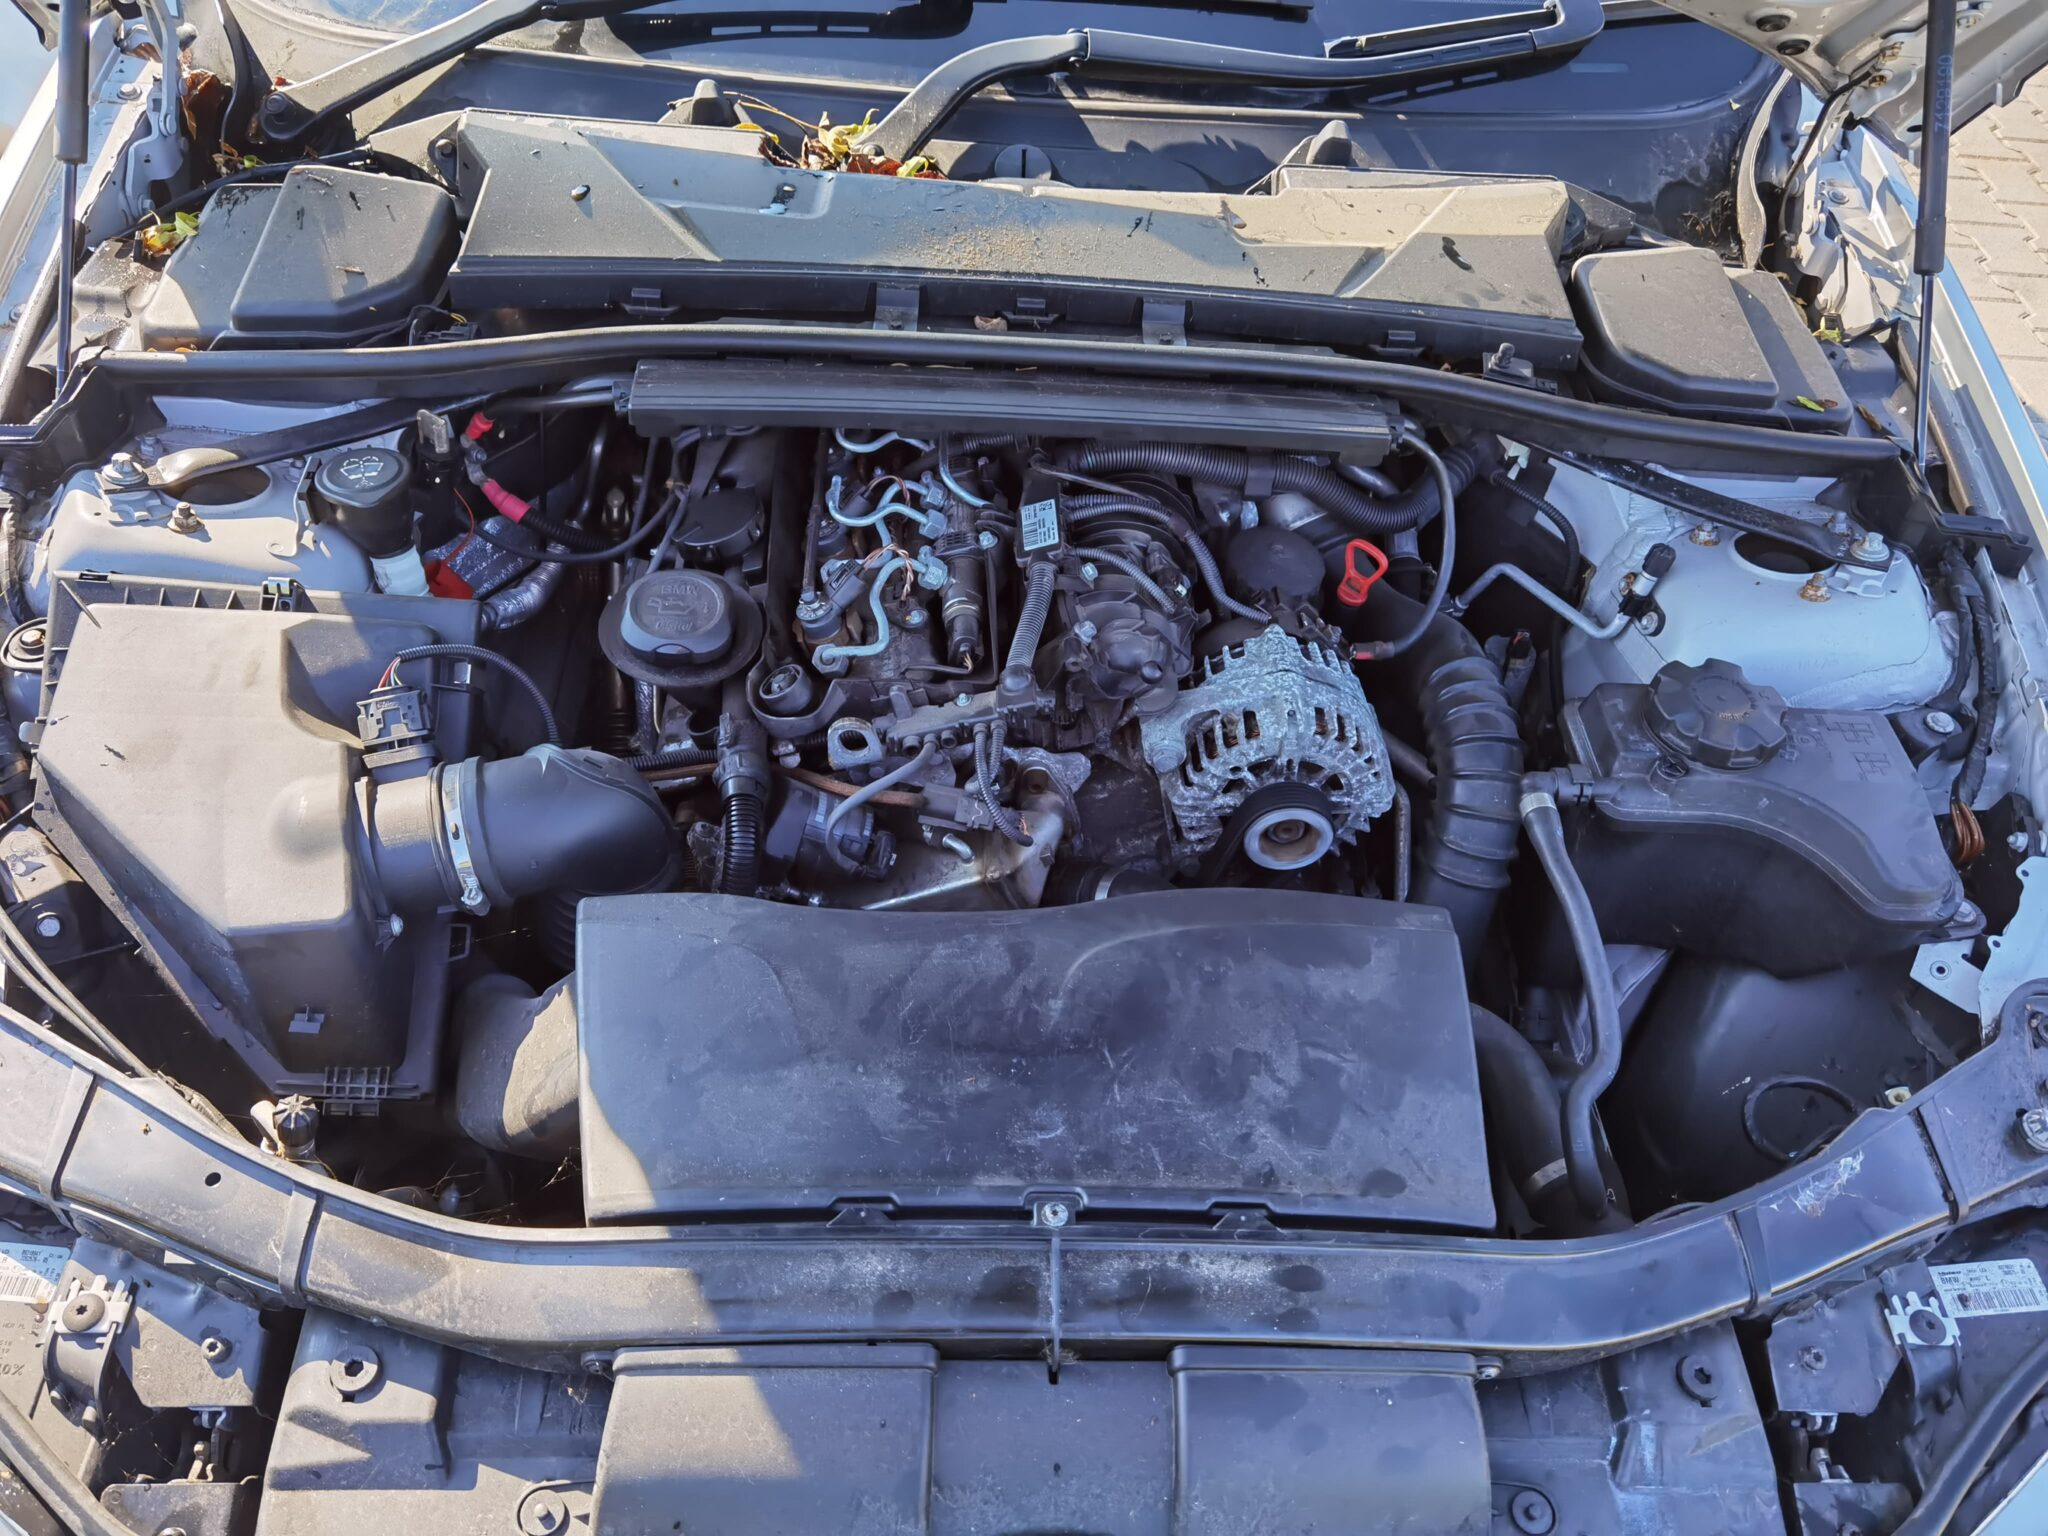 BMW E90 lci 318d Carbon Car Center Békéscsaba-17